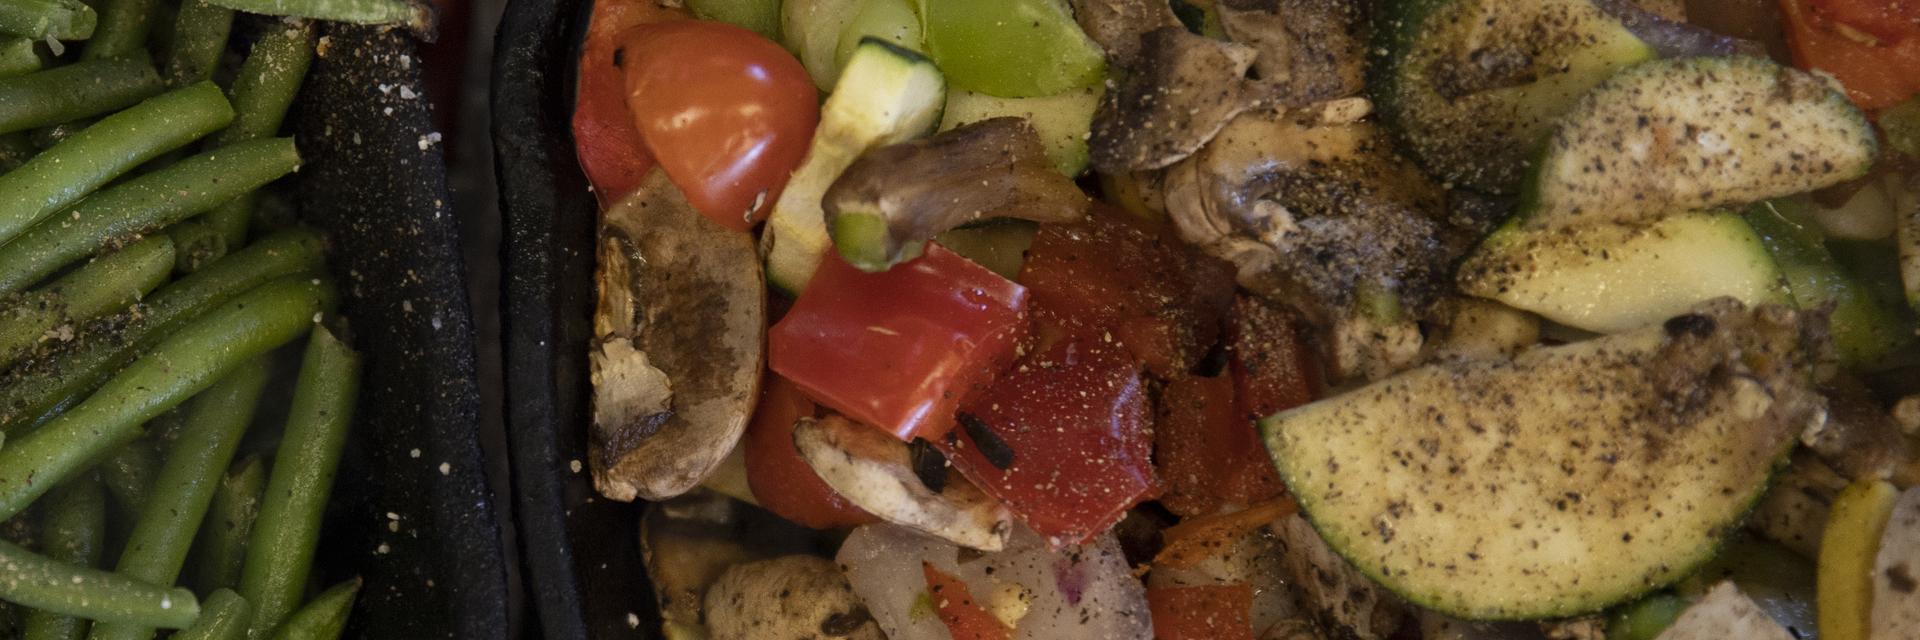 Vegetable sides from Do Mundo's on Monday April 22, 2019. Sam O'Keefe/University of Missouri